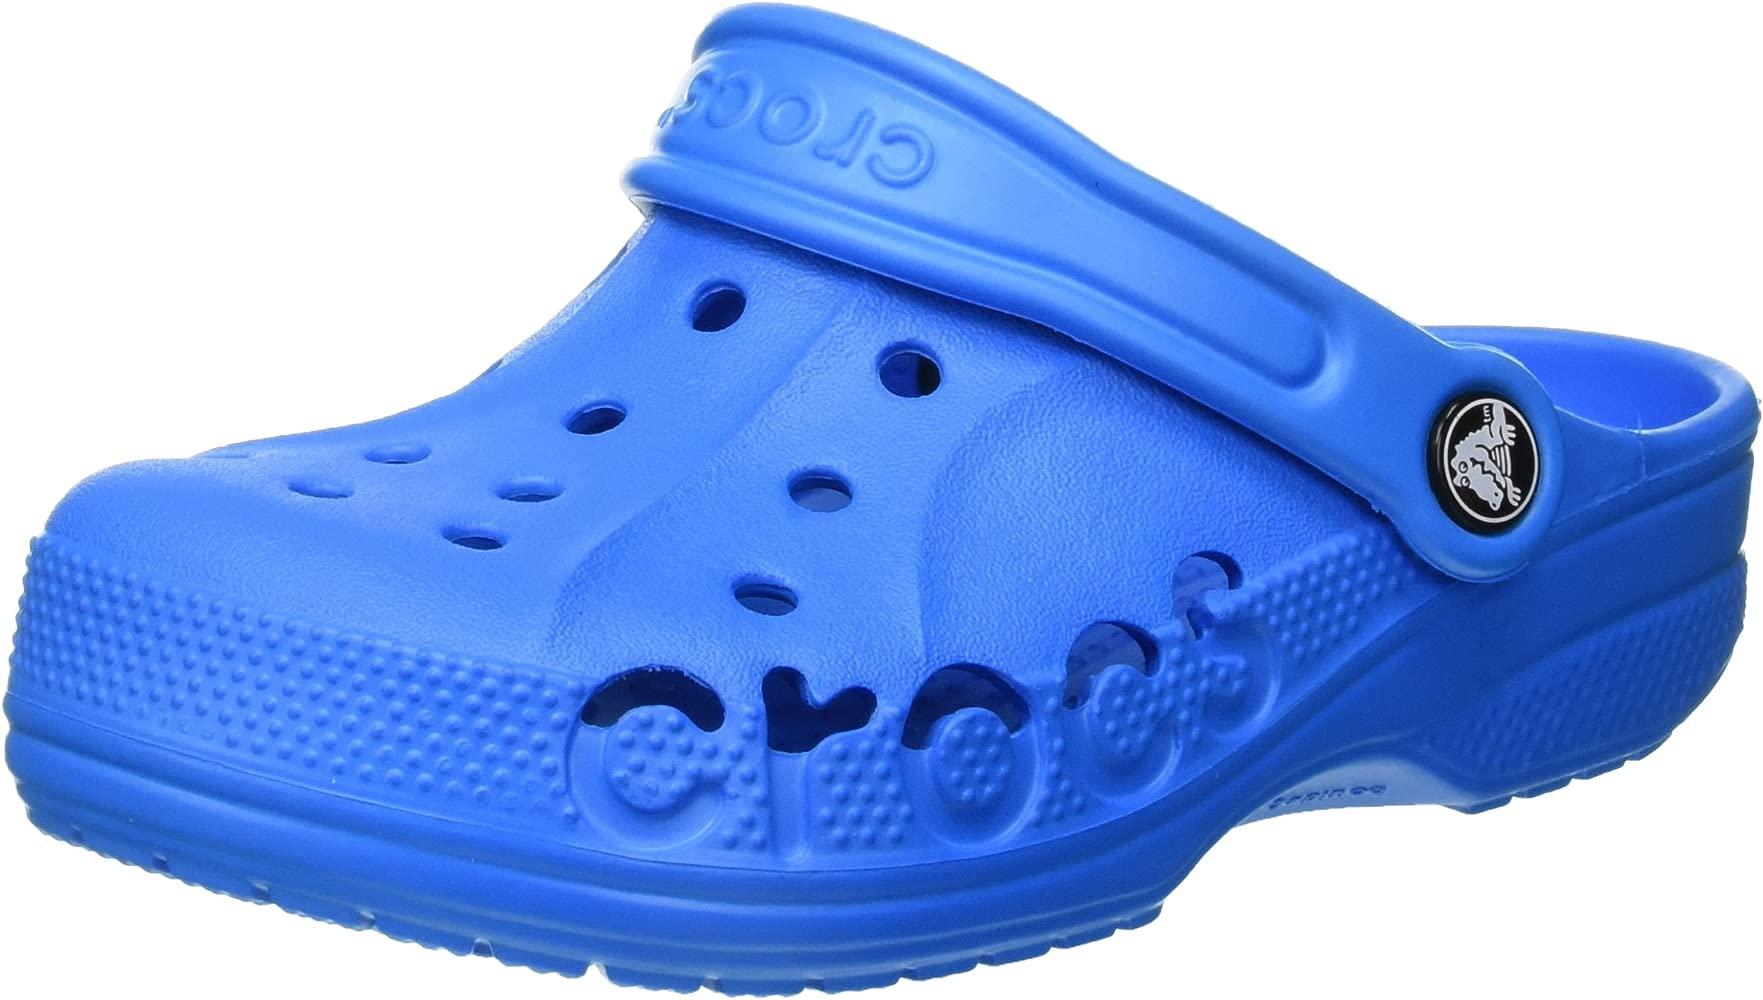 Crocs Kids Baya Clog Childs Cloggs